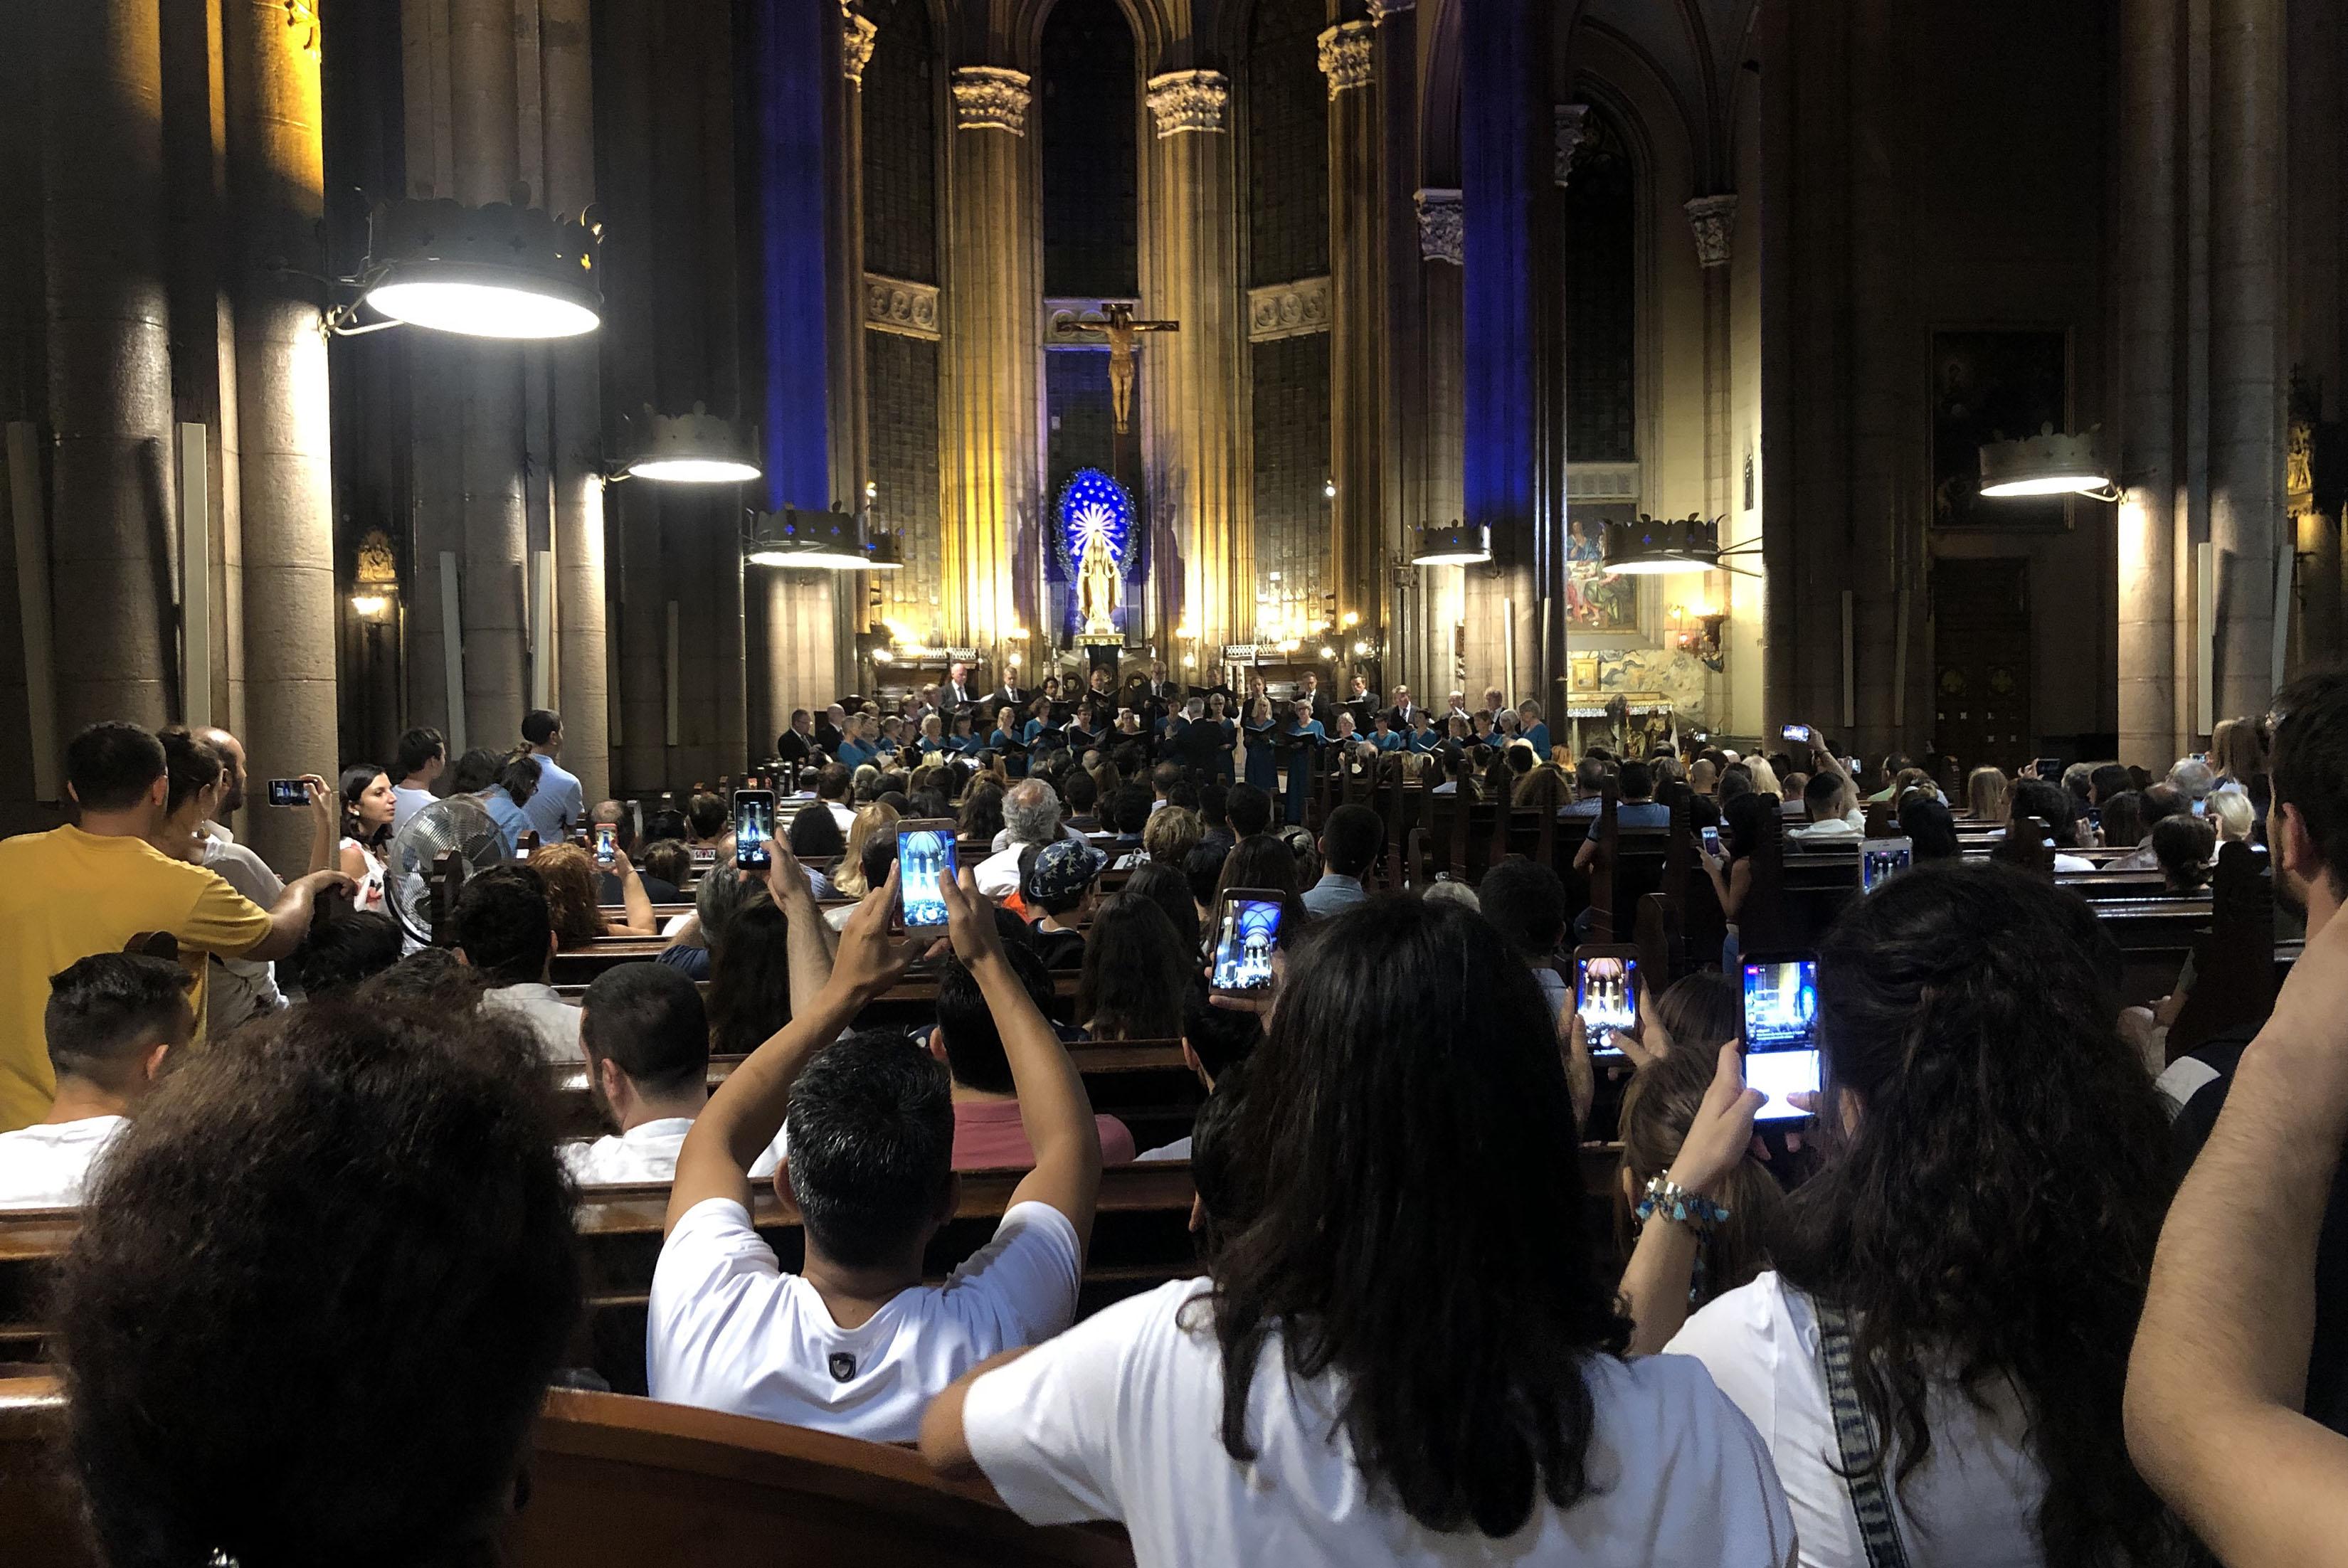 Hedvig Eleonoras kammarkörs konsert på St. Antoine kyrkan, Istanbul.